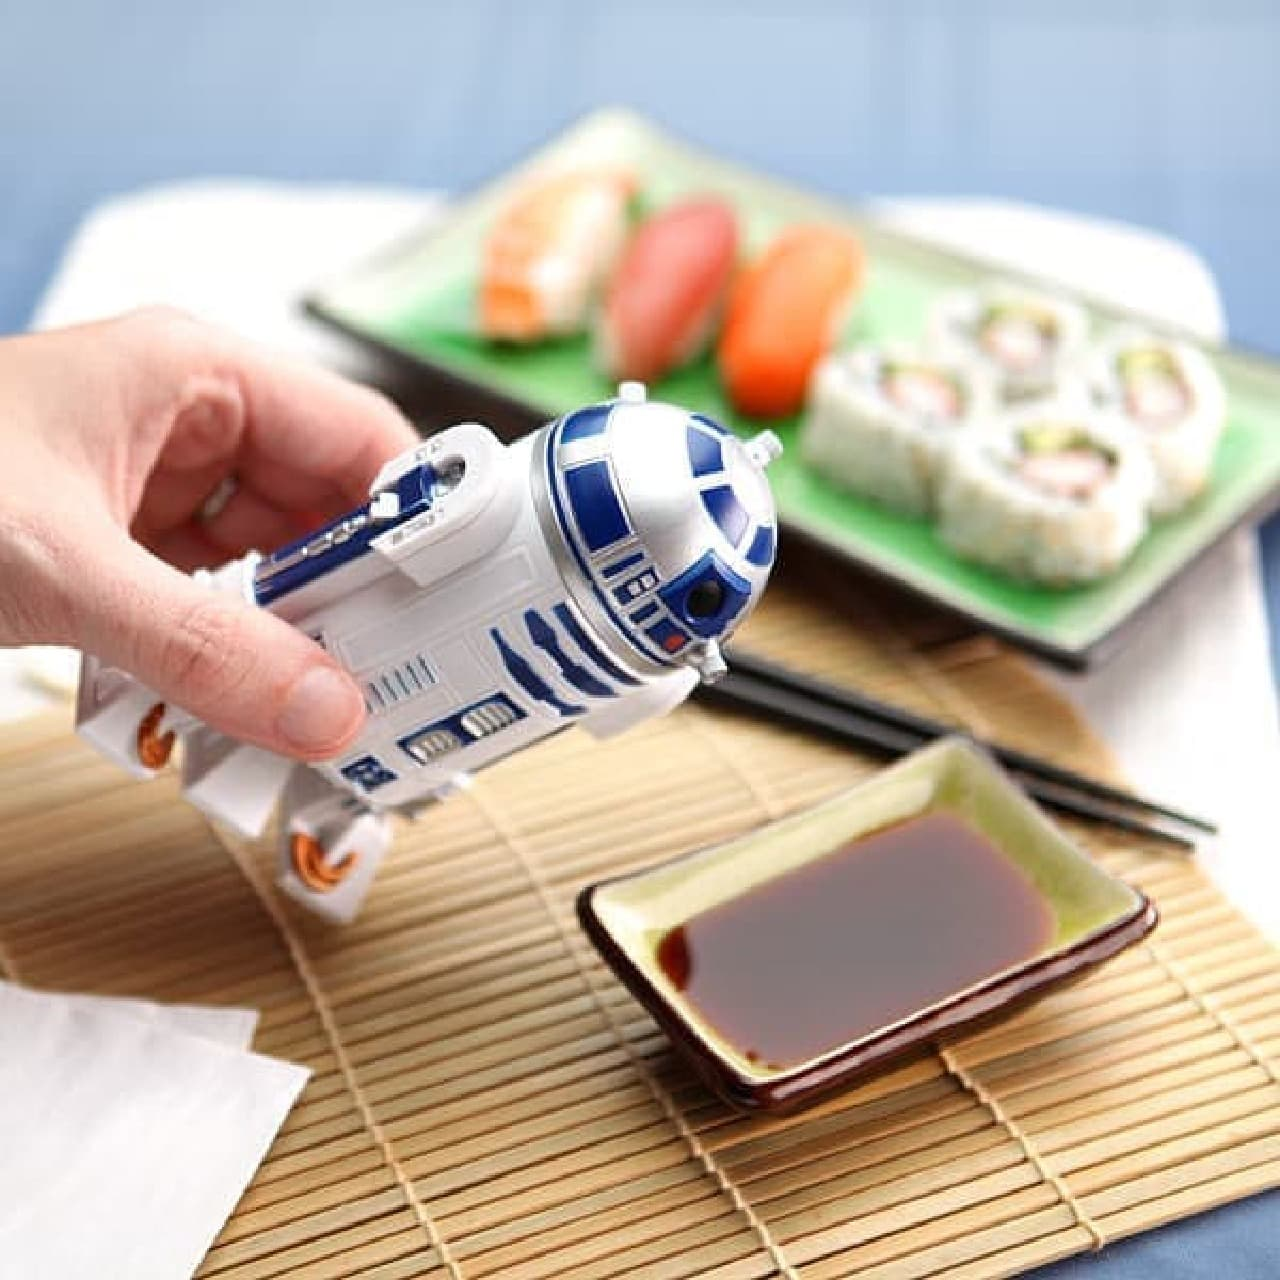 R2-D2型醤油差し「R2-D2 Soy Sauce Dispenser」  スター・ウォーズグッズって、ほんといろいろありますね